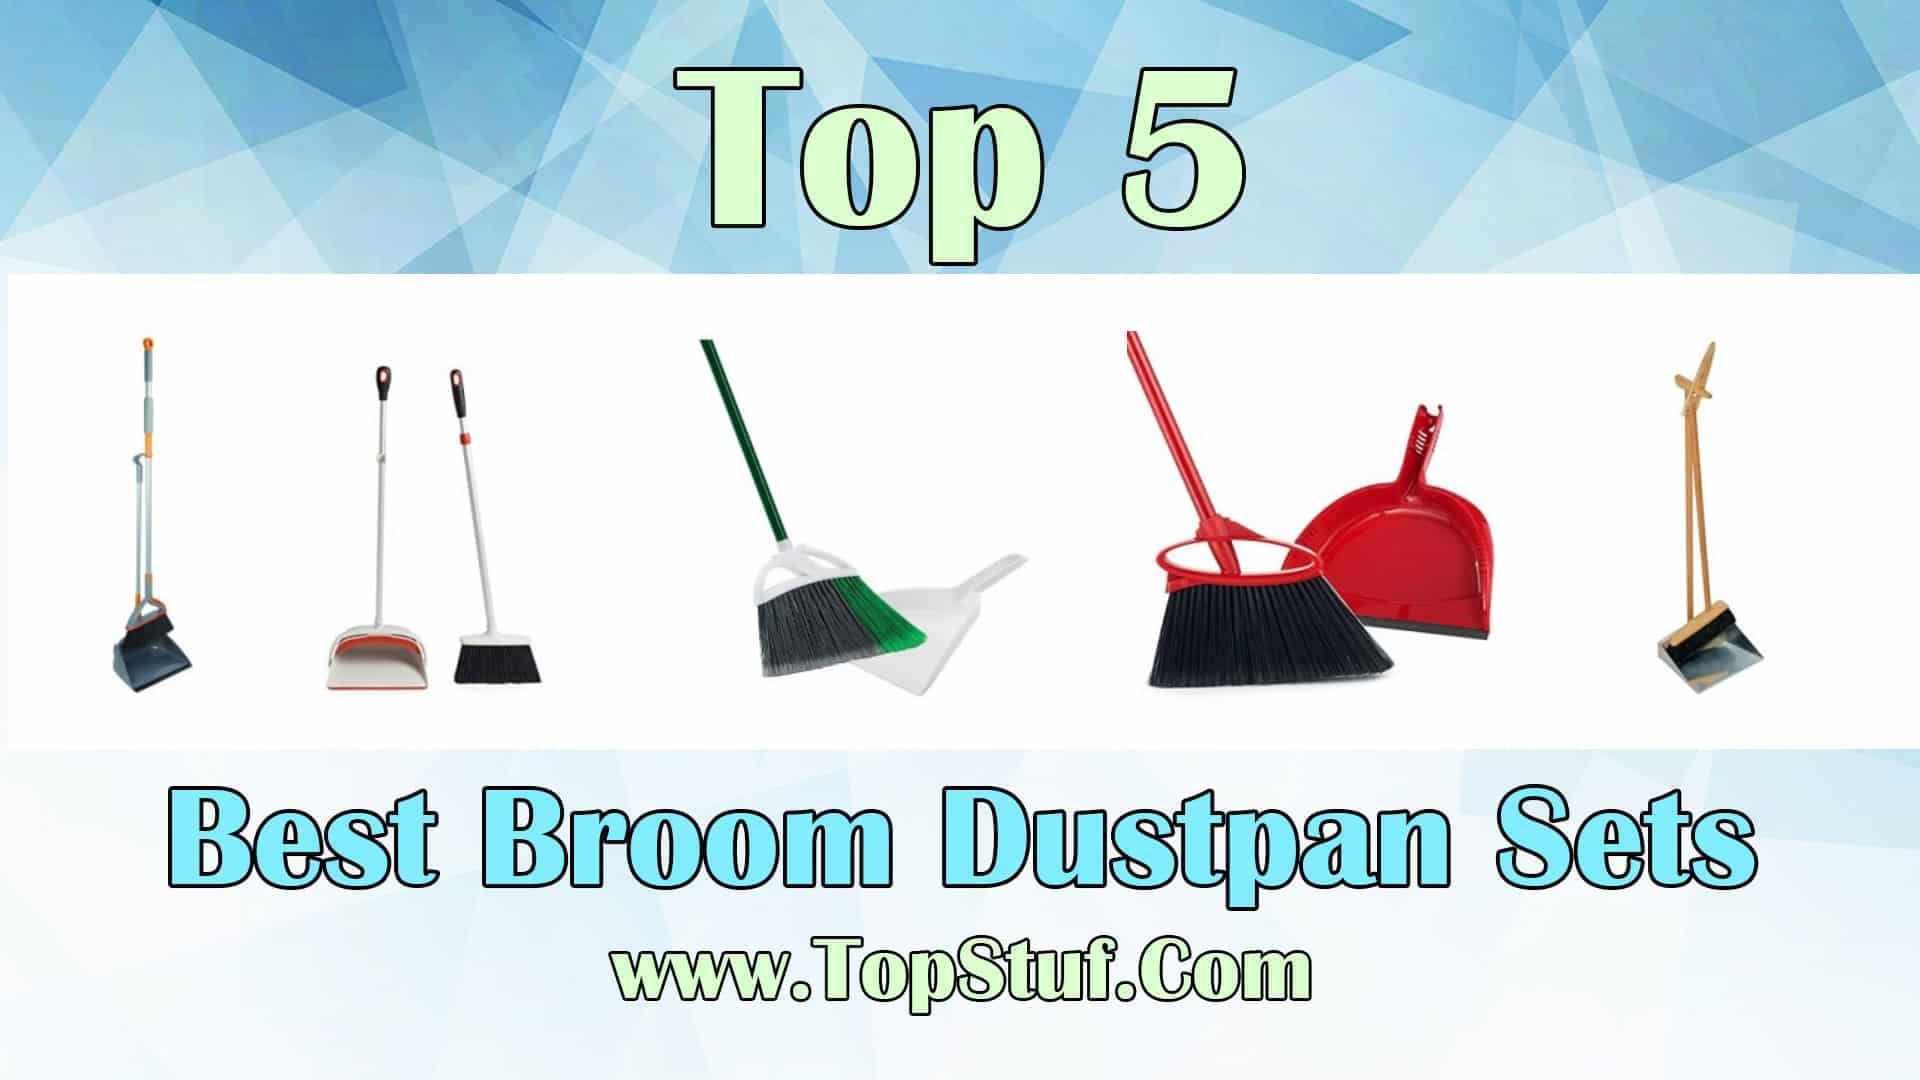 Best Broom Dustpan Sets